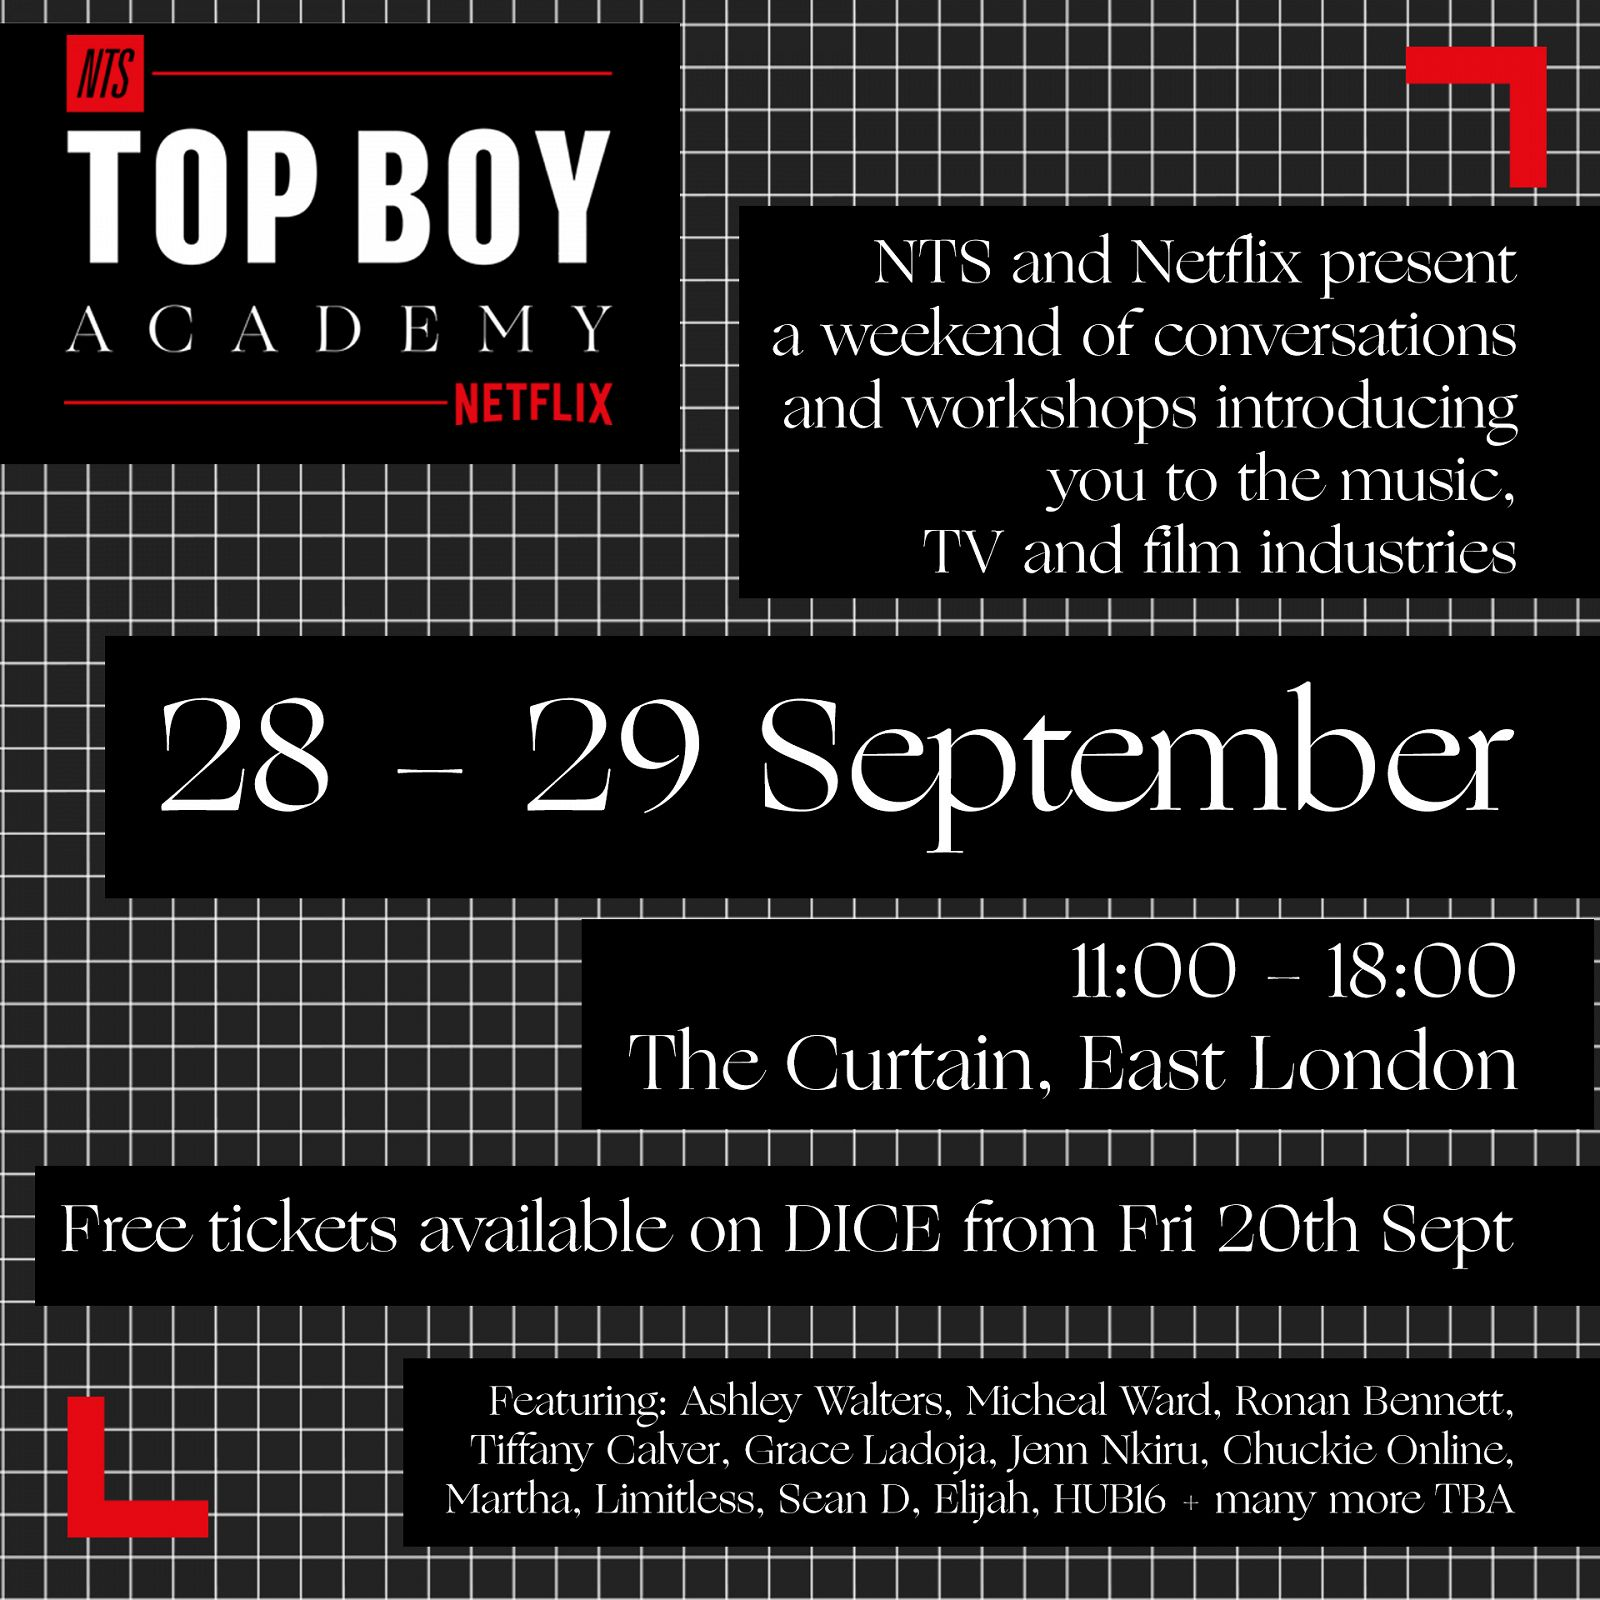 Top Boy Academy Announcement Square.jpg